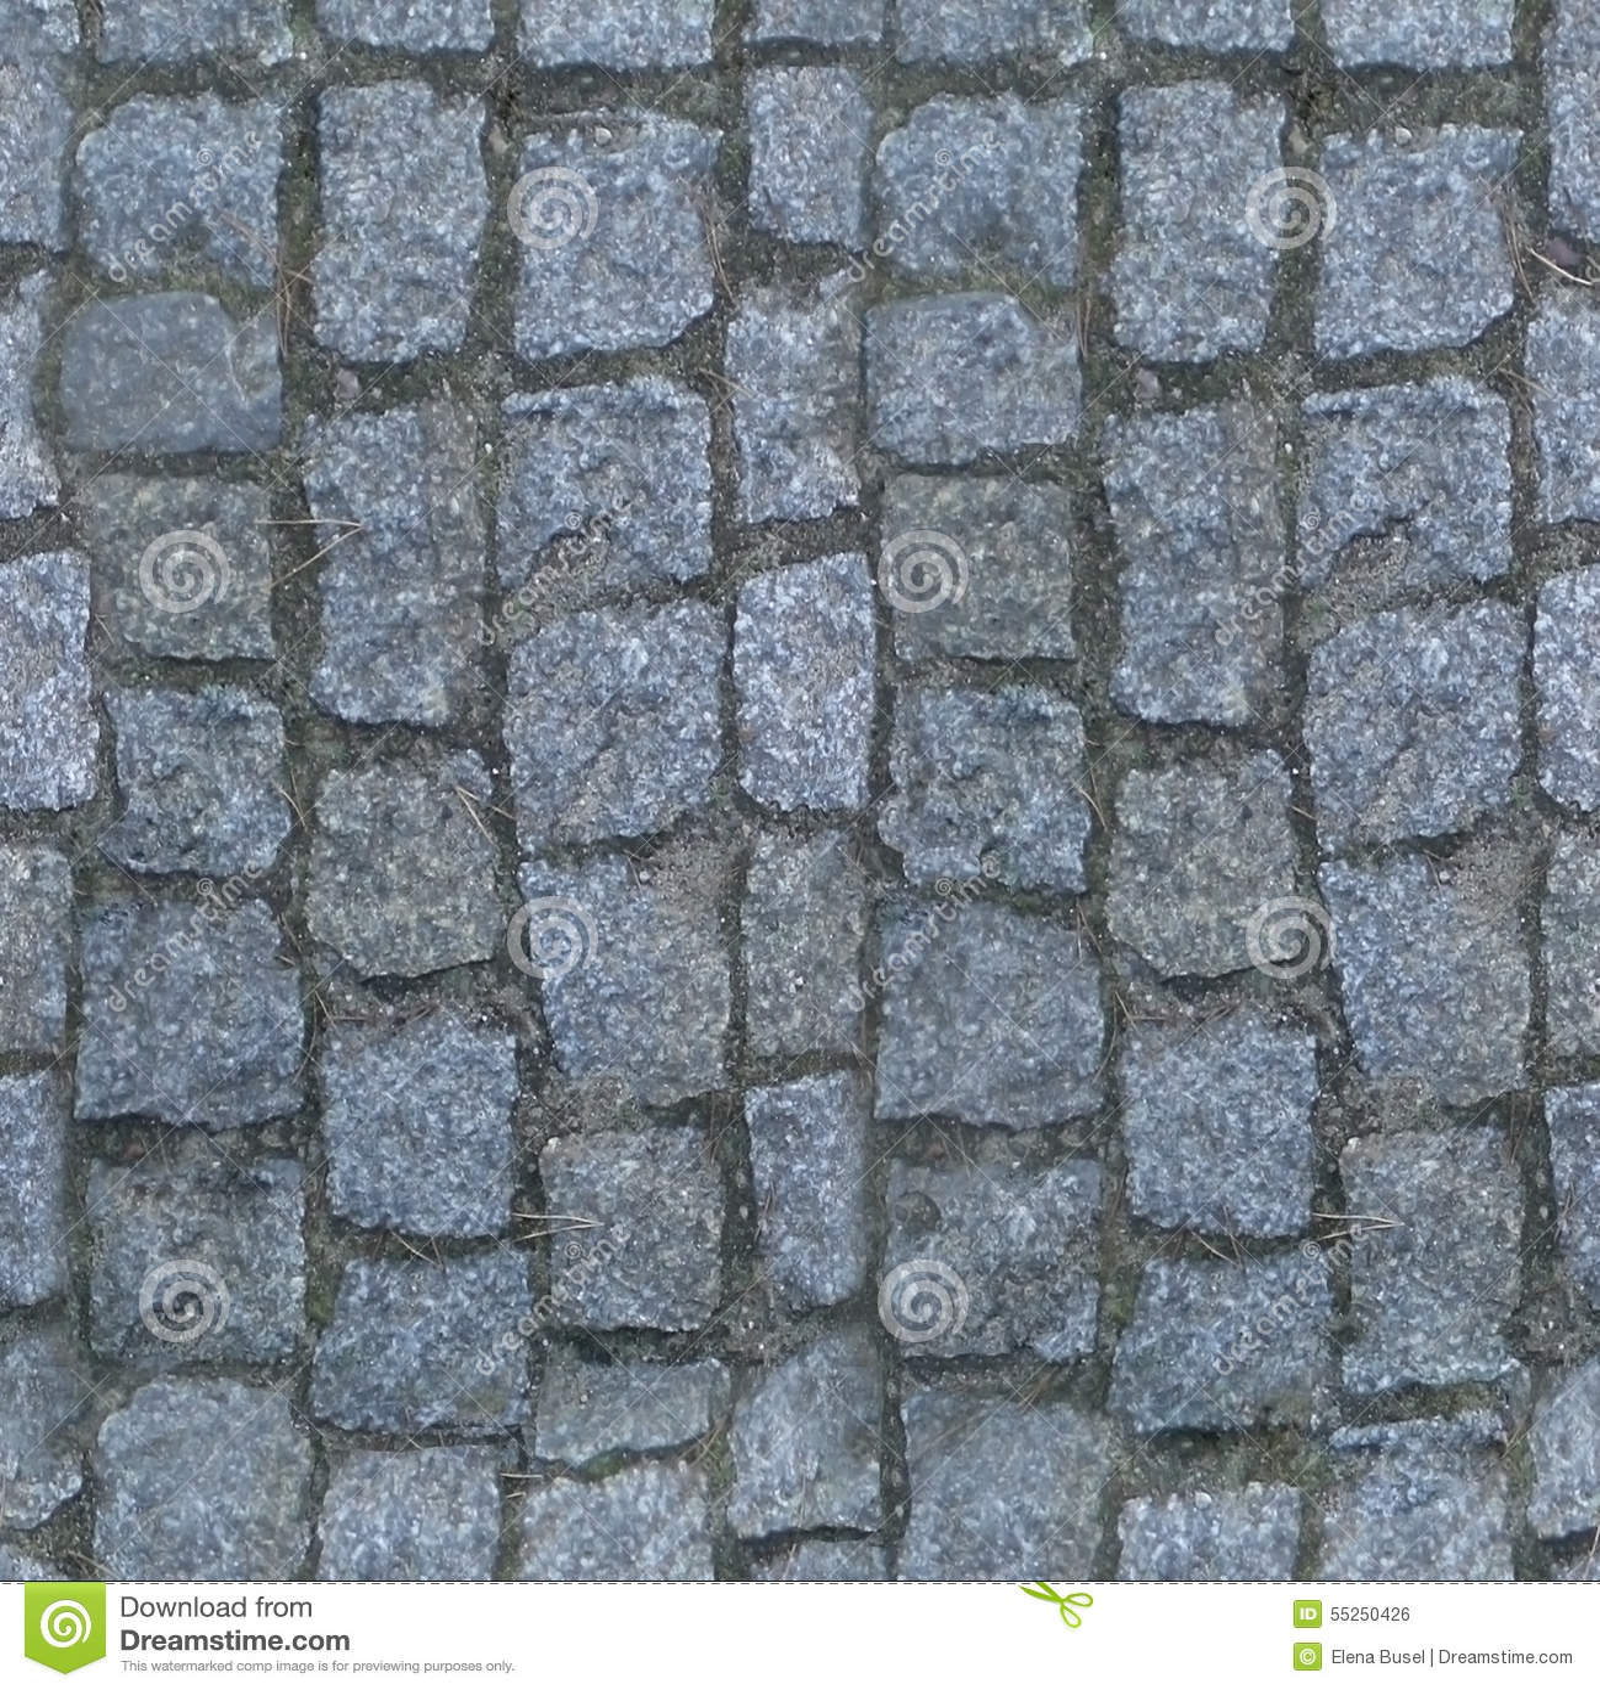 cartoon square stones texture - photo #4